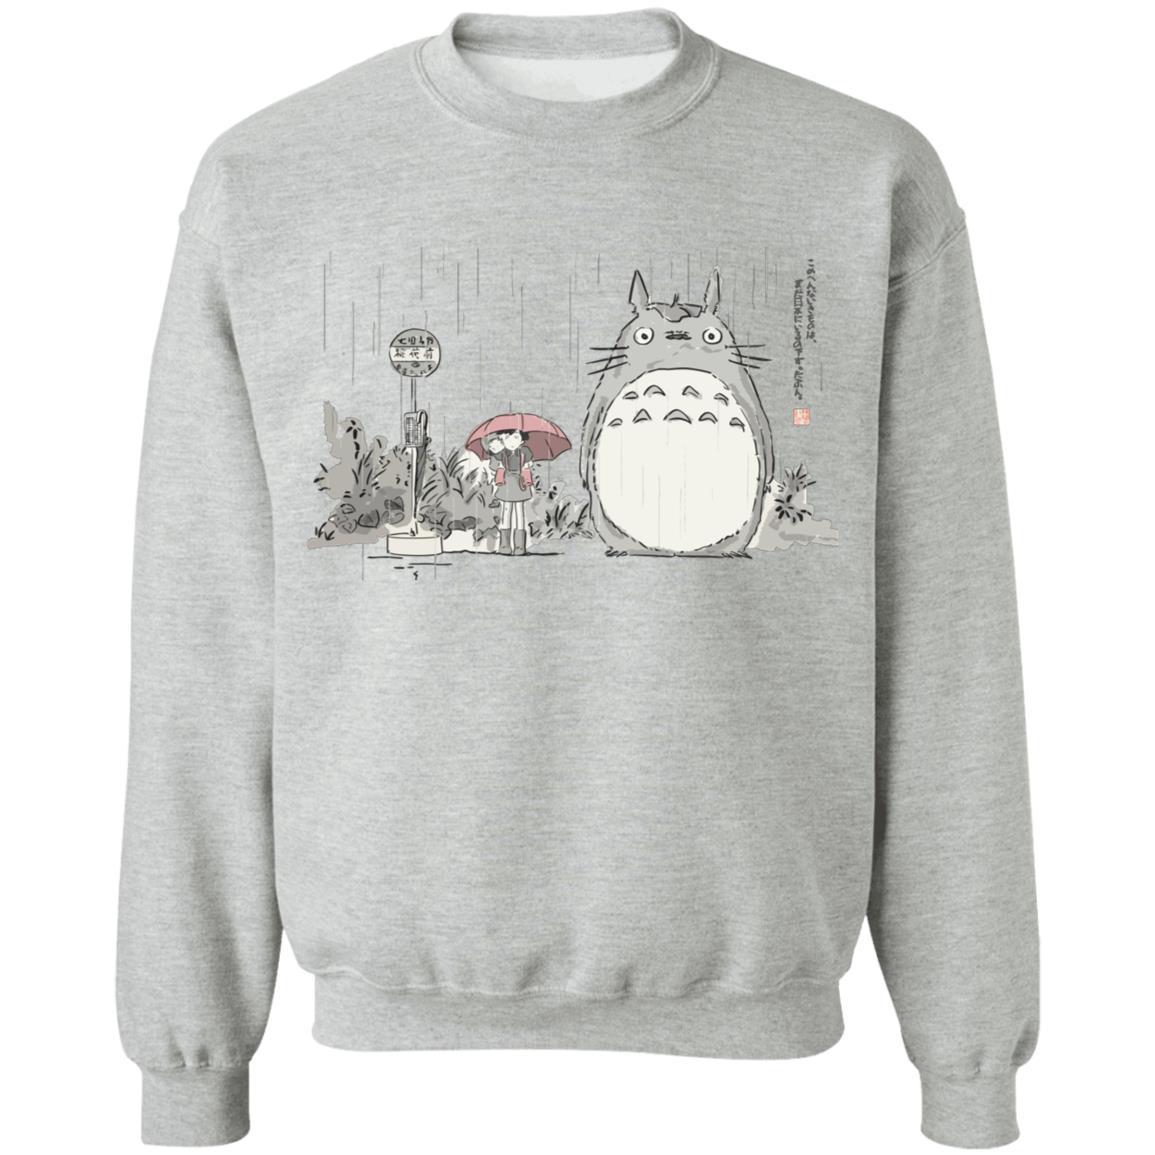 Totoro At The Bus Stop Sweatshirt